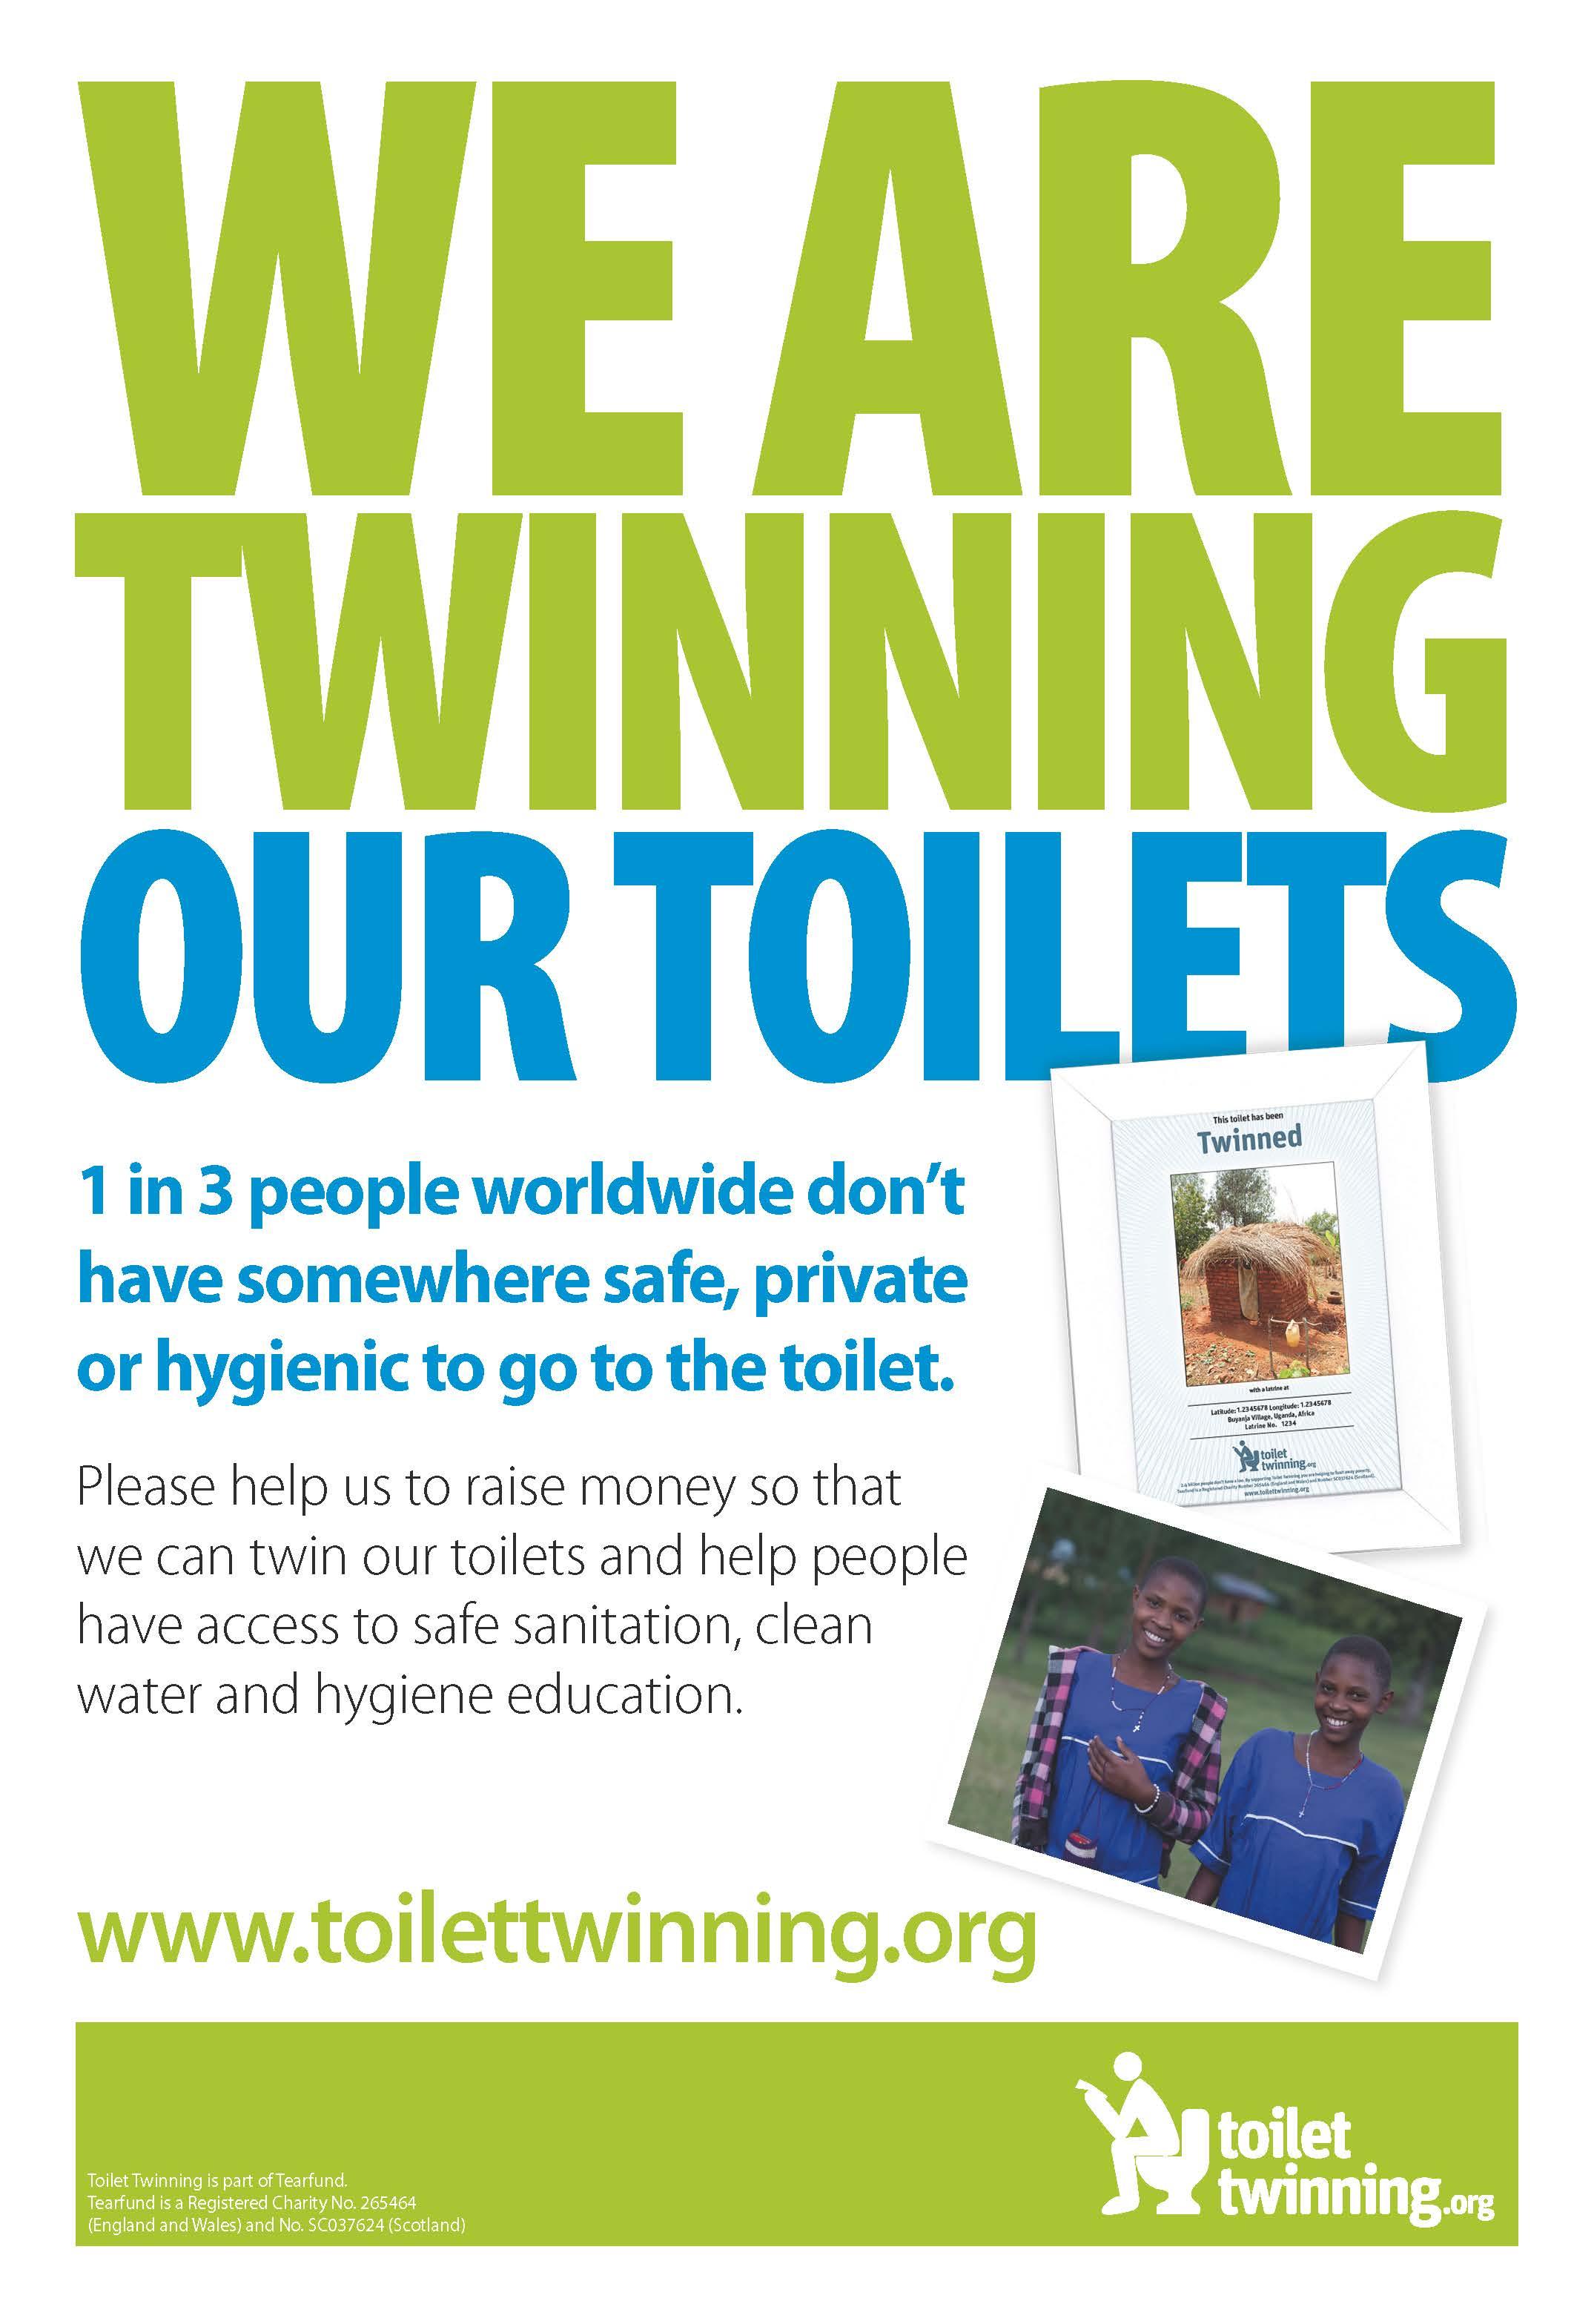 Toilet twinning at Fisherton Mill